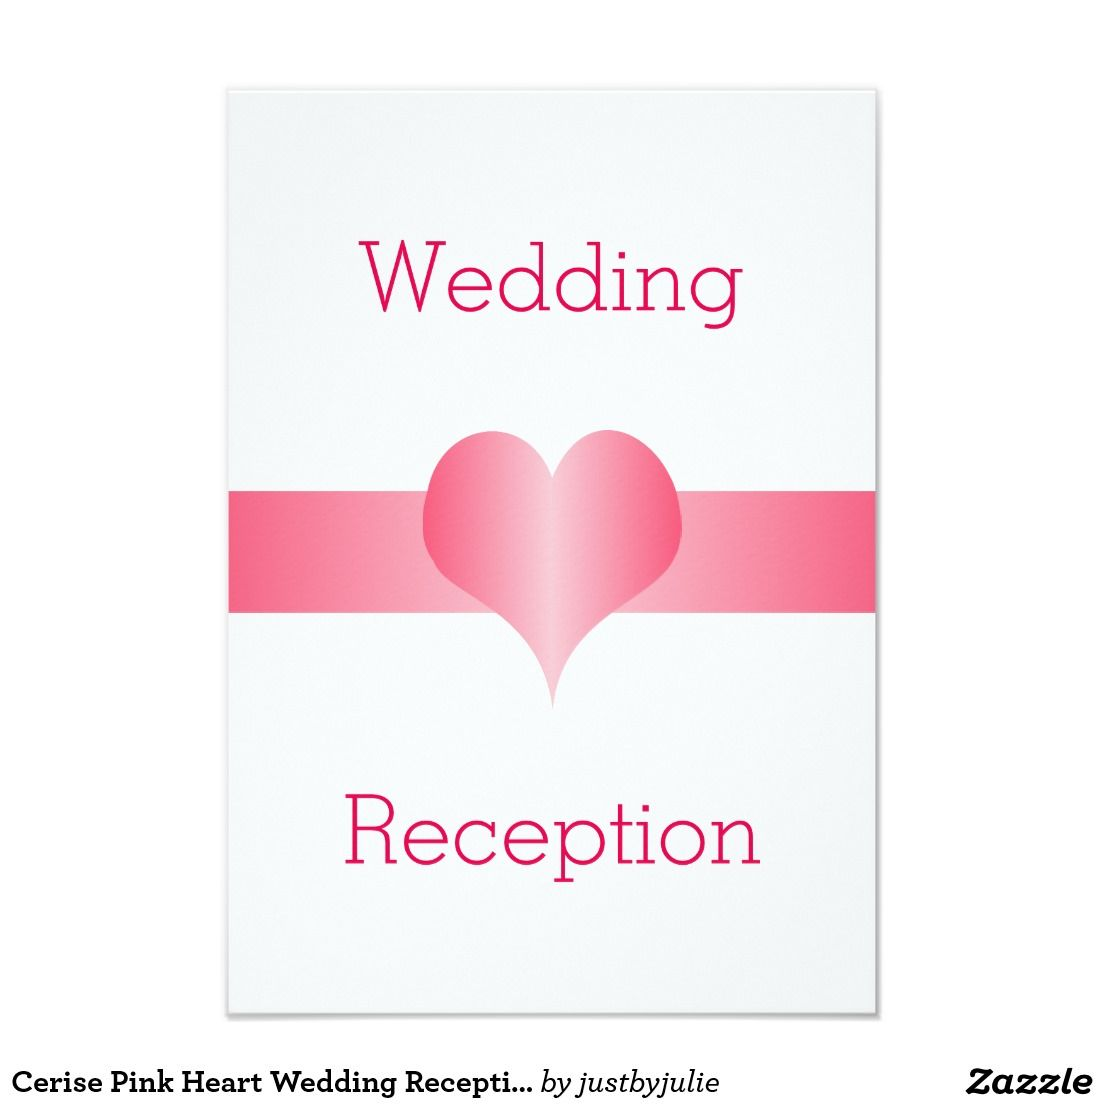 Cerise Pink Heart Wedding Reception Card | Cerise pink, Wedding ...